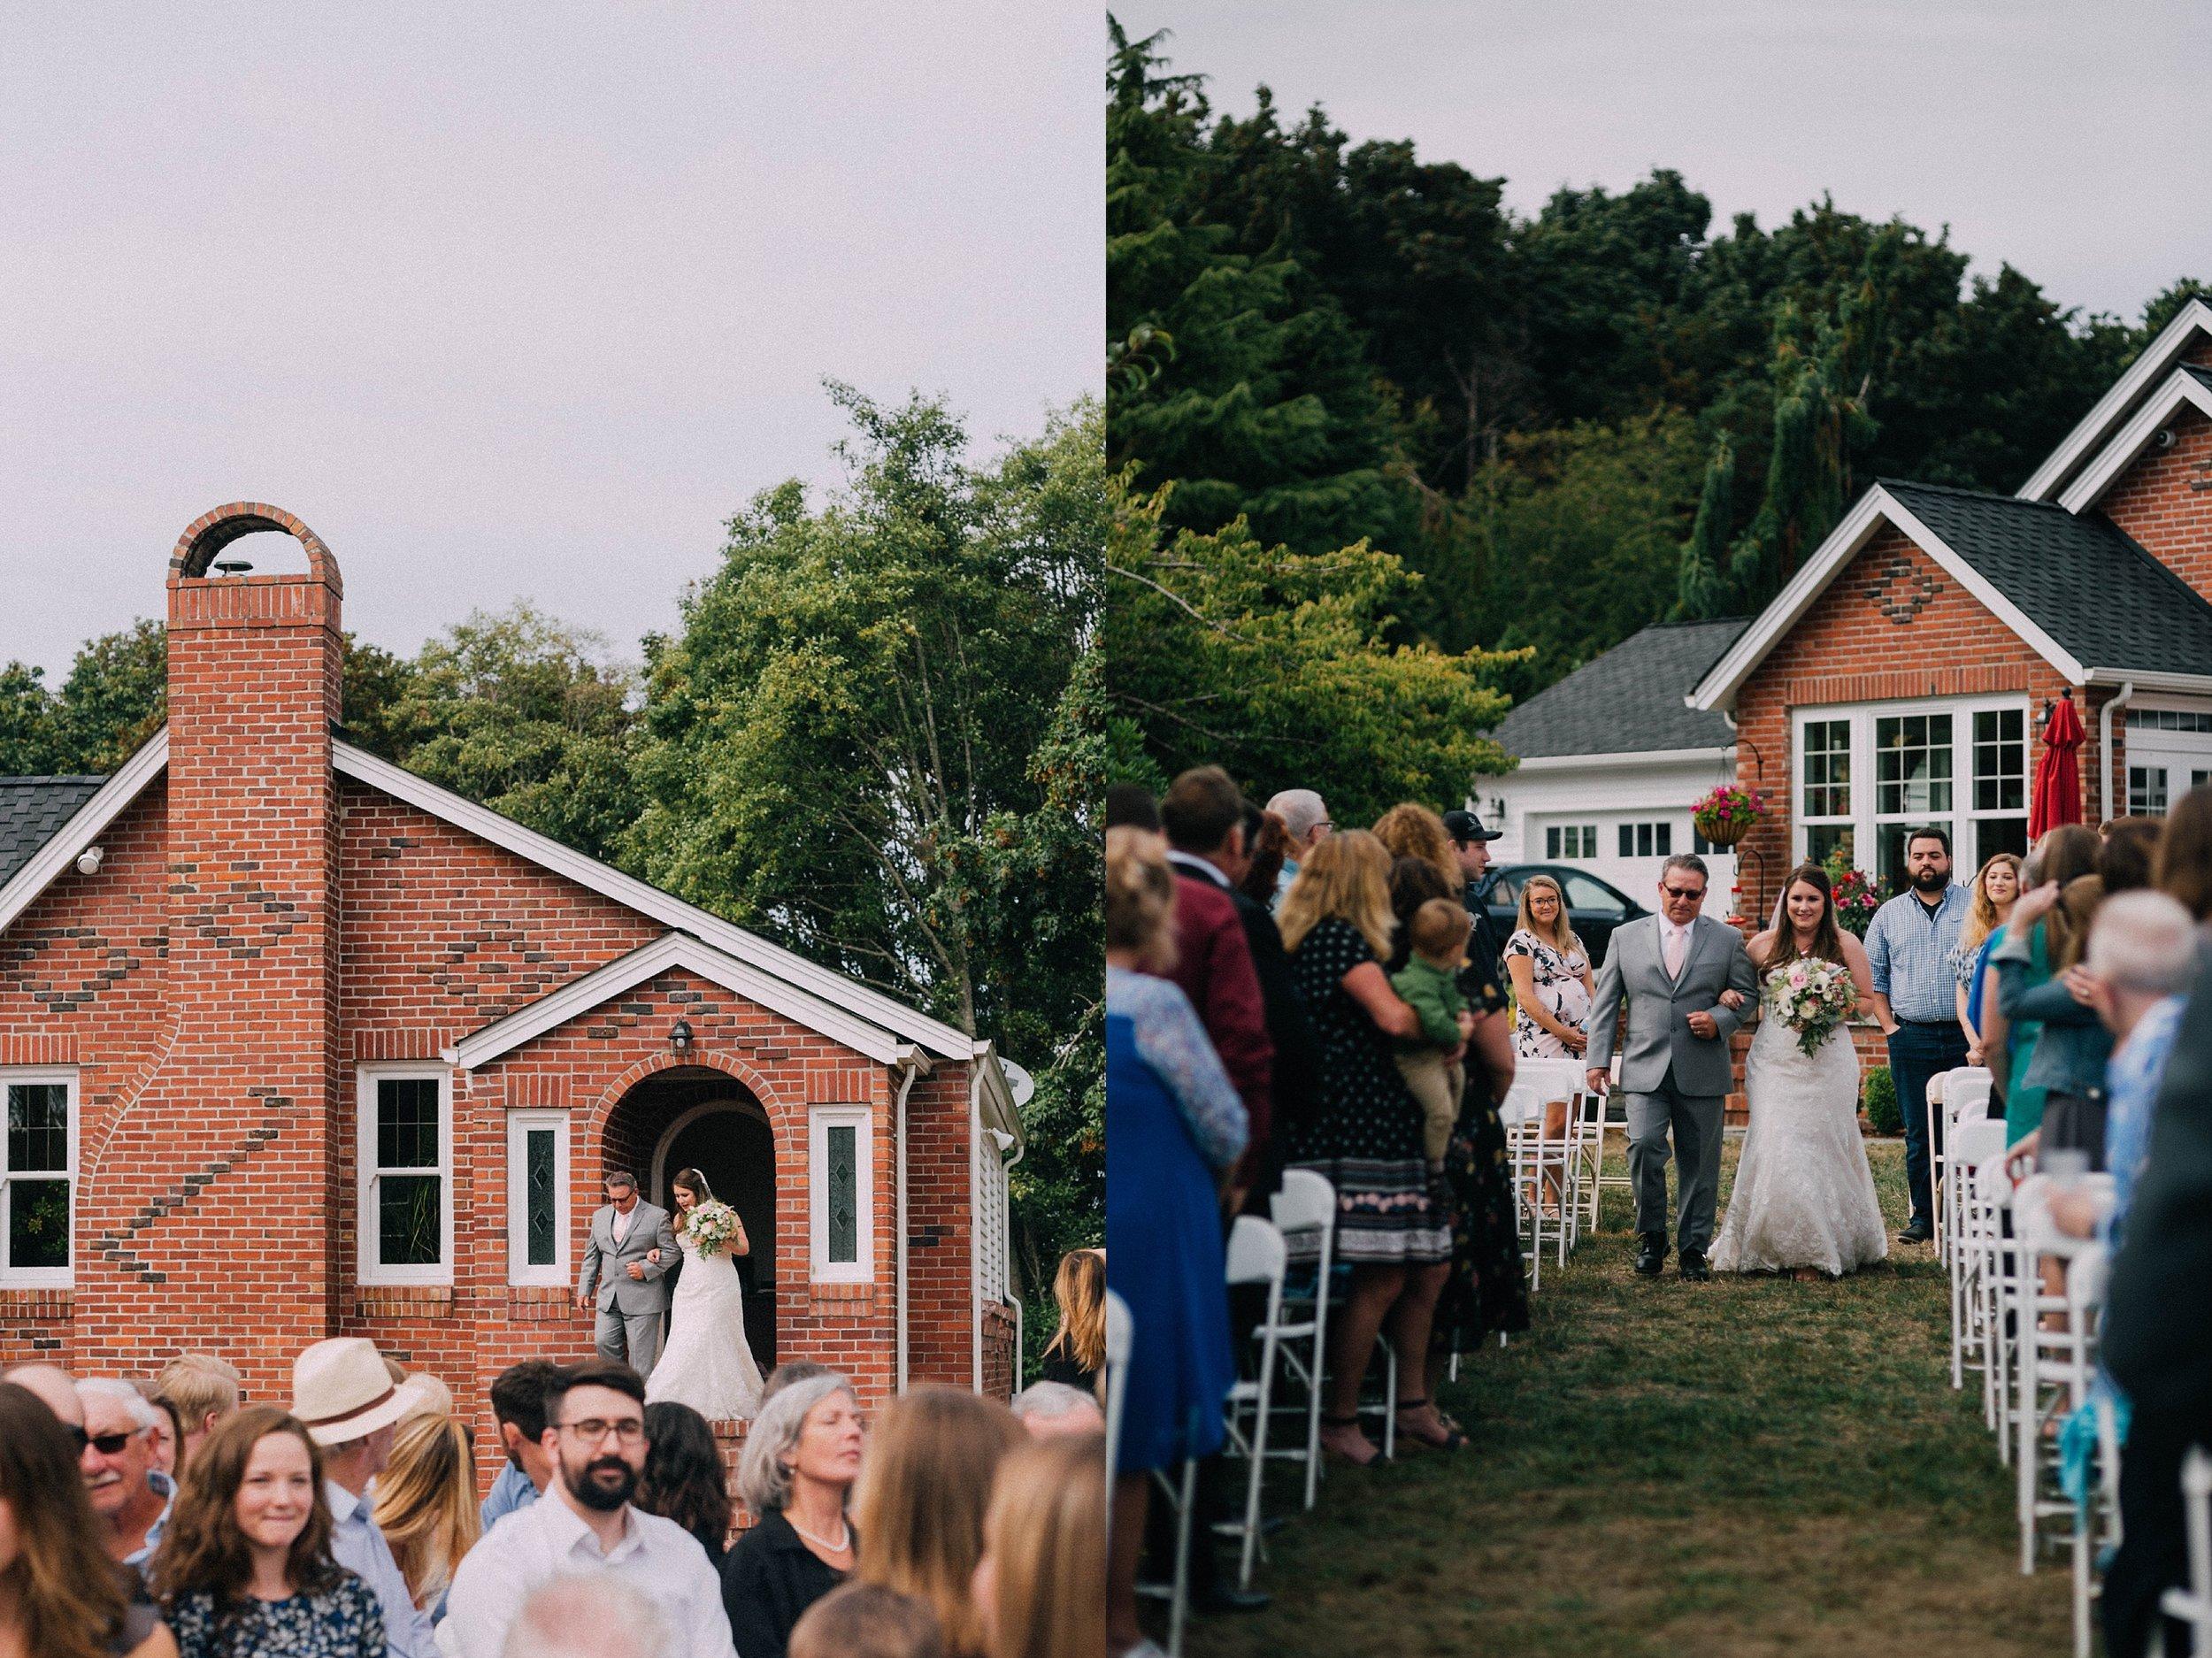 karisa ryan - vashon island backyard wedding photographer - seattle area backyard wedding photography - ashley vos-1.jpg